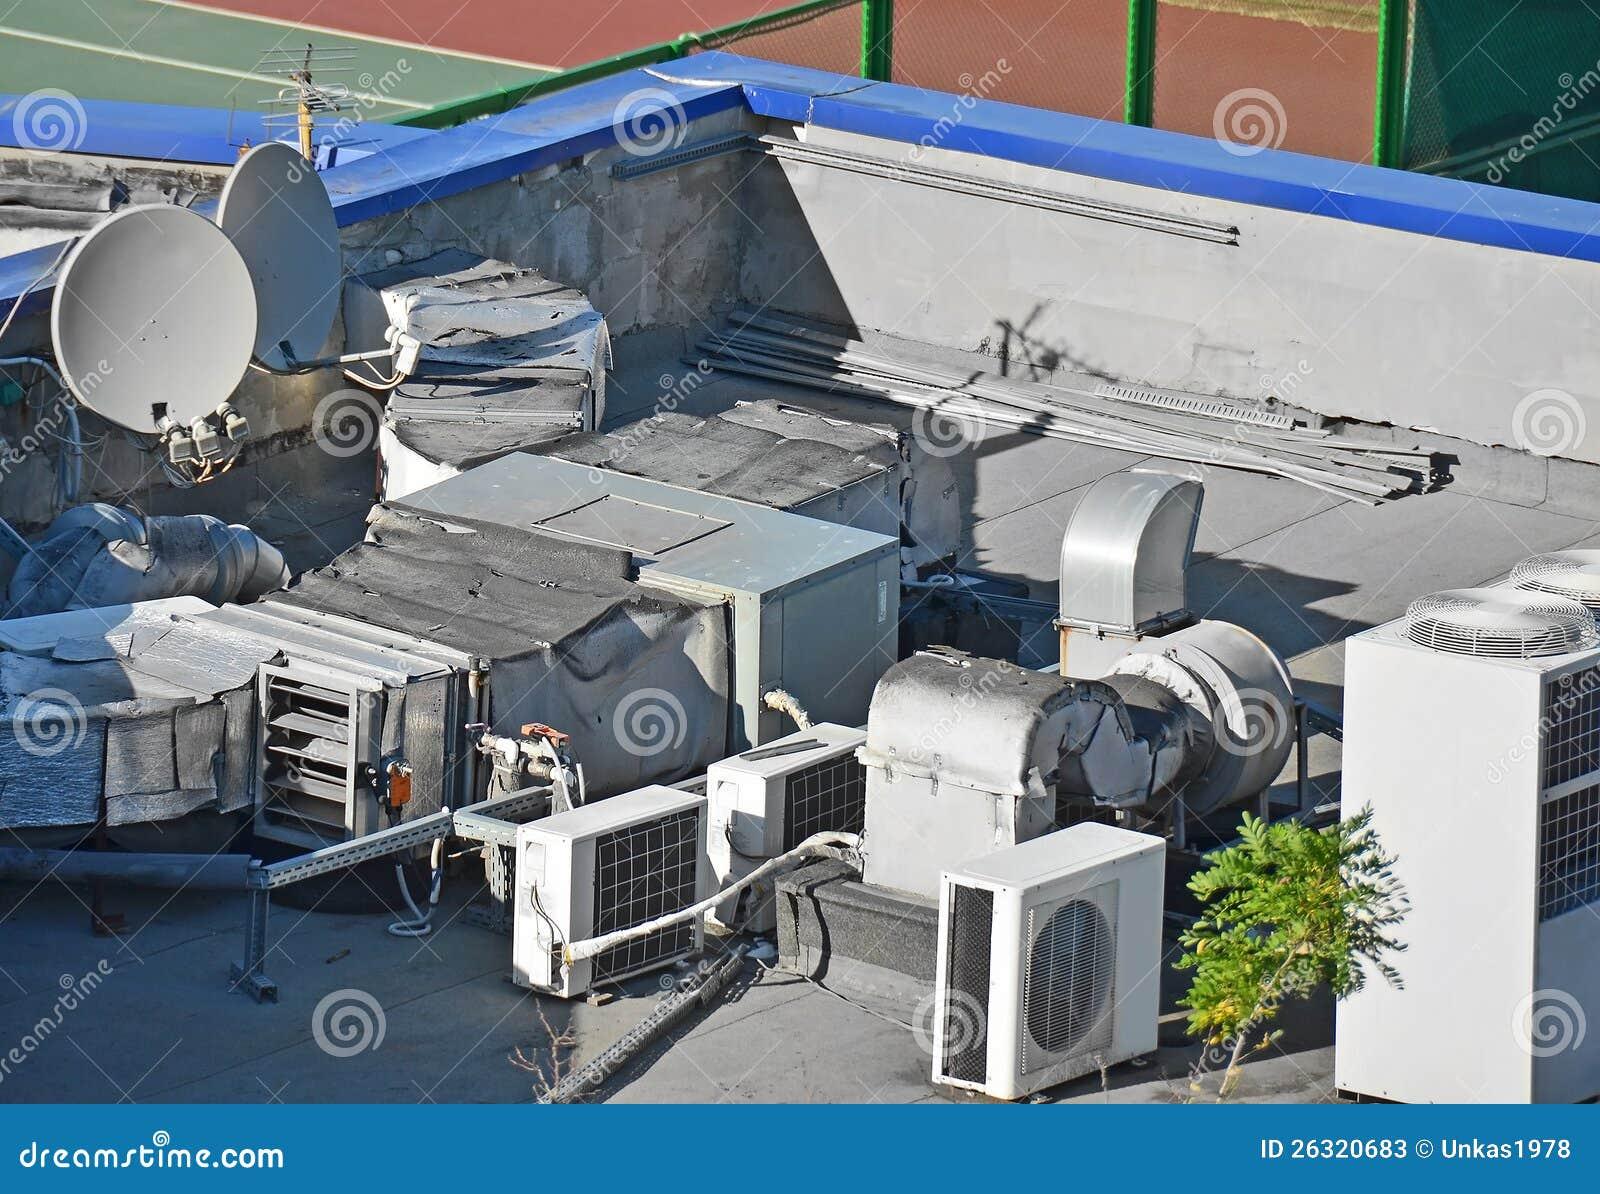 Industrial Air Ventilator : Industrial ventilation system stock photos image